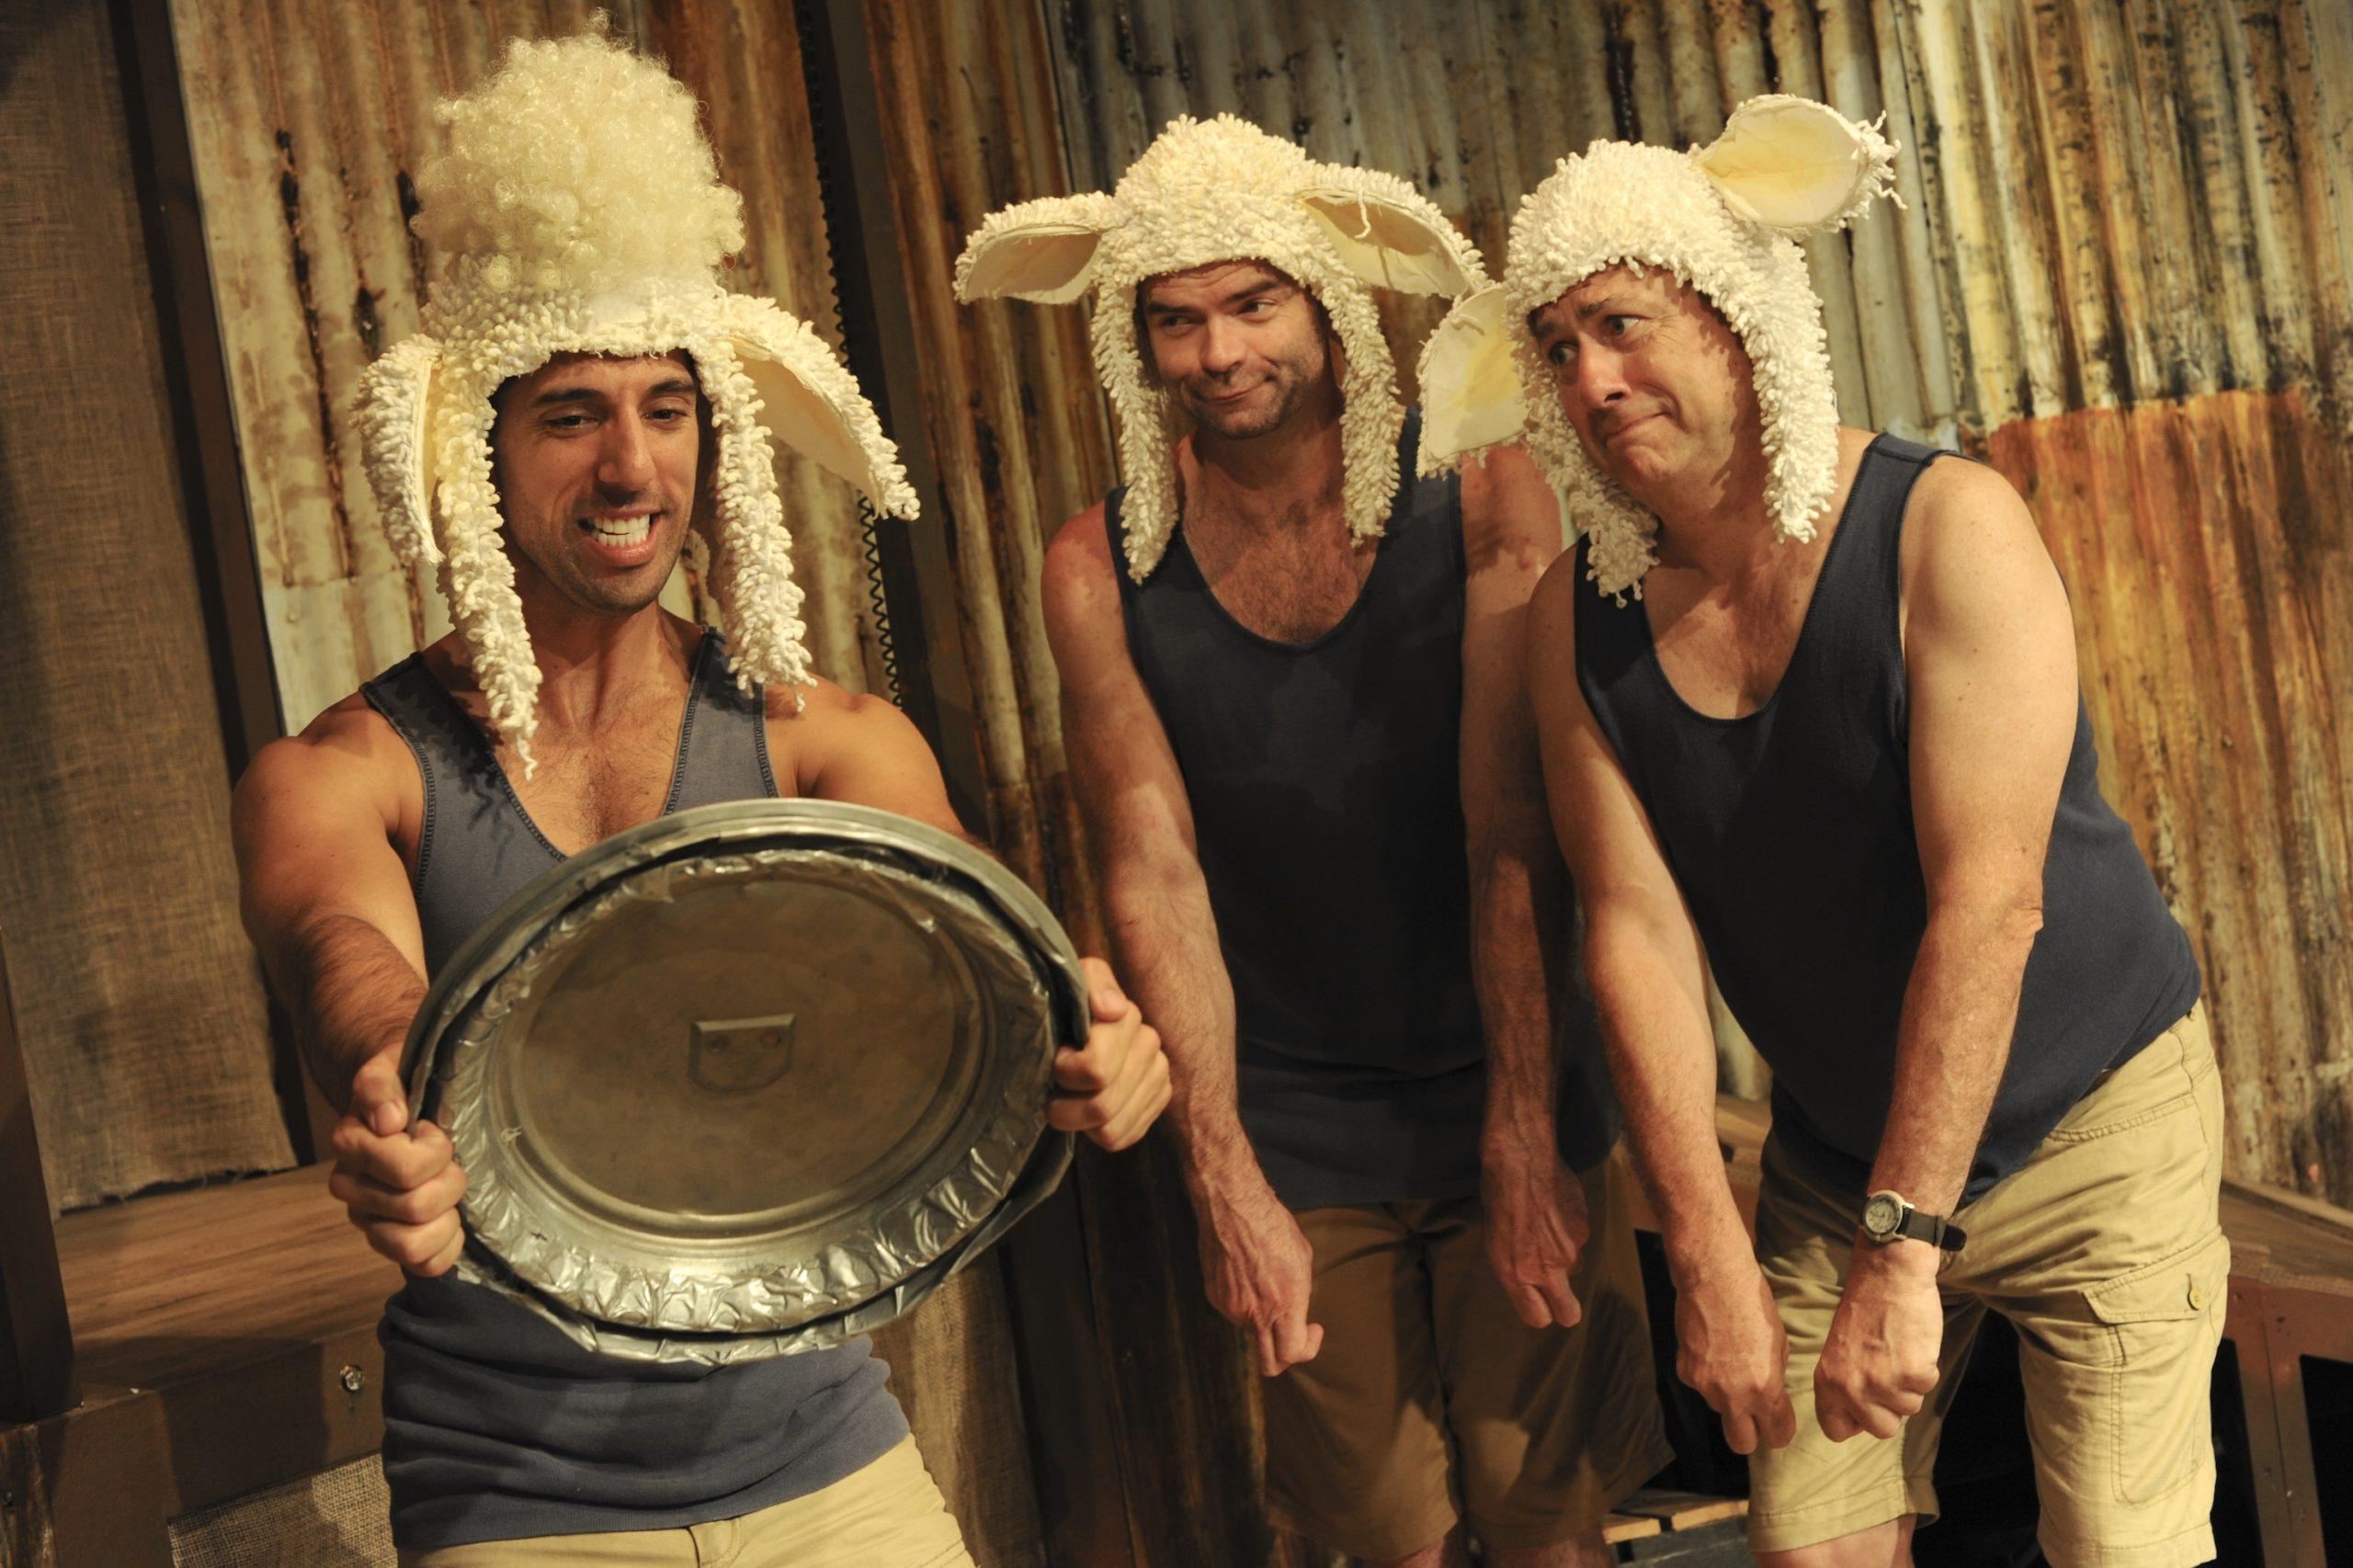 6. Hero Pete The Sheep 2014 credit HeidrunLohr